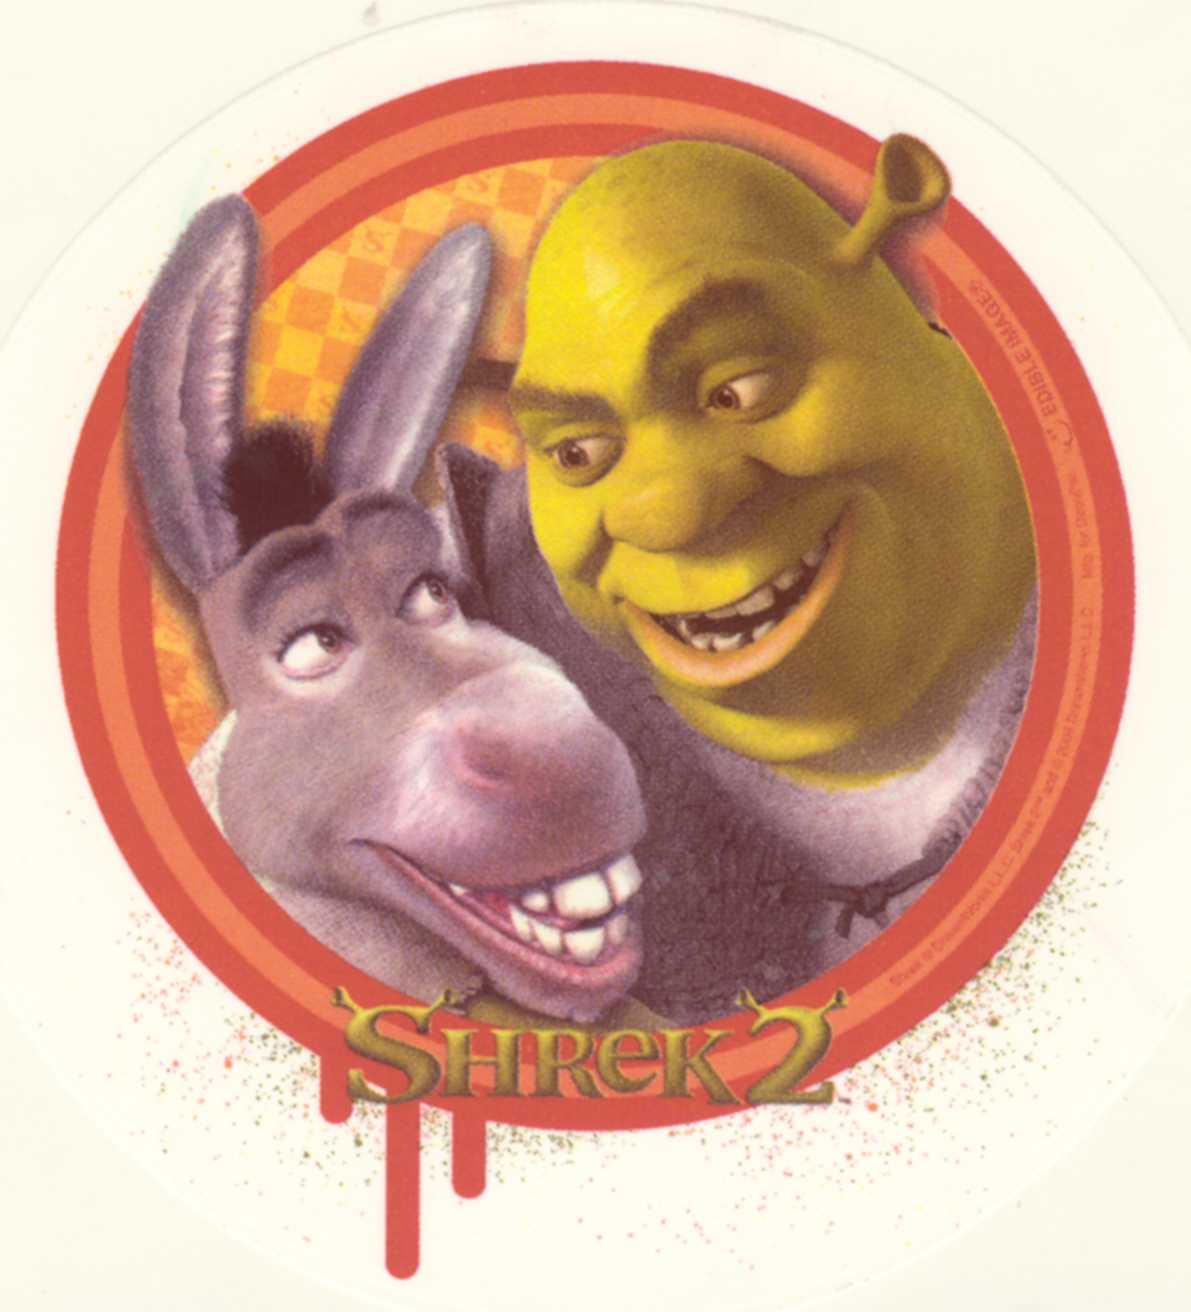 Shrek nackt hentia pic